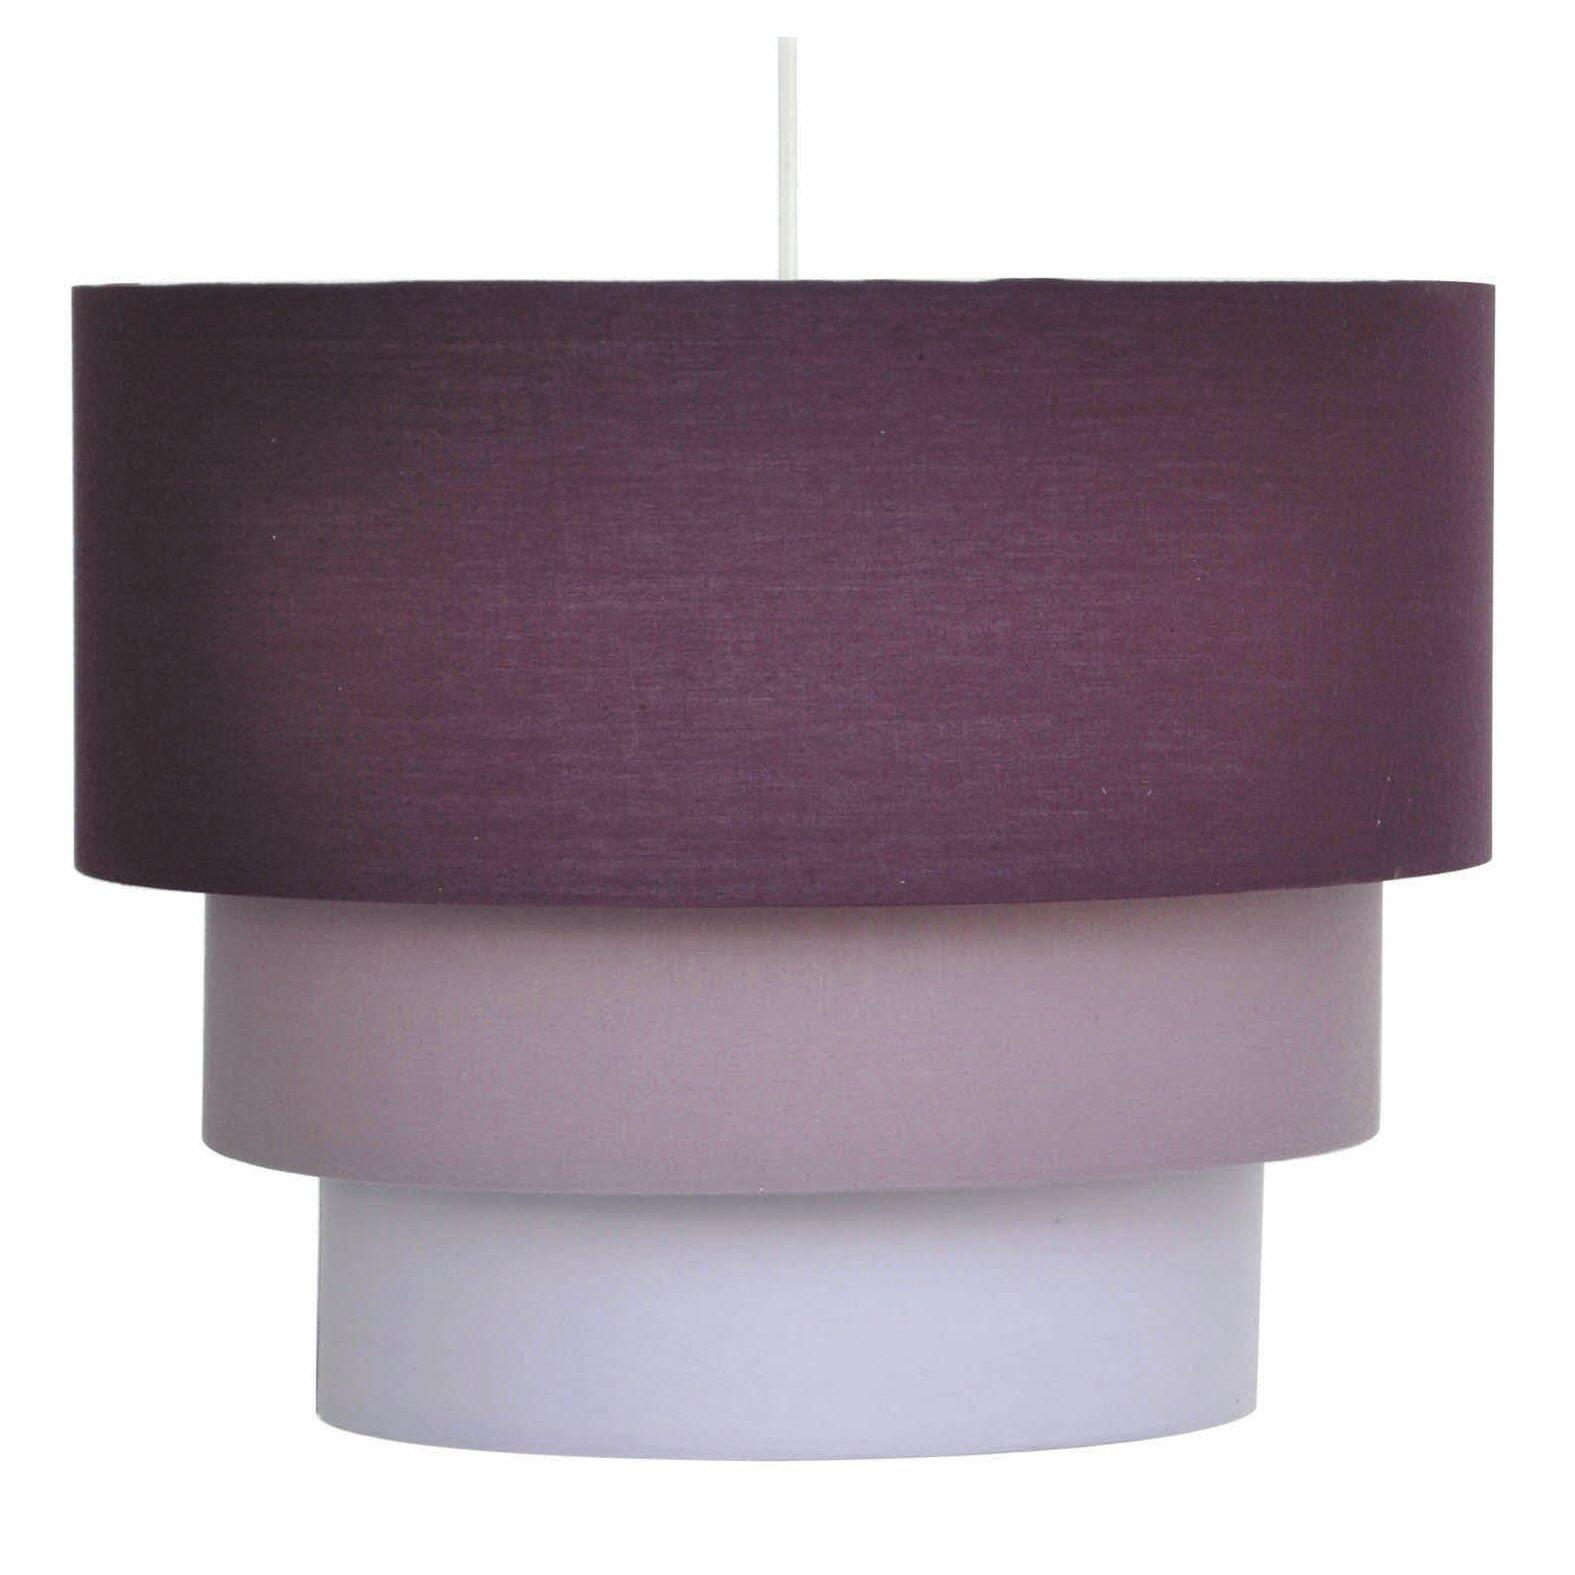 30 cm lampenschirm aus stoff von pacific lifestyle. Black Bedroom Furniture Sets. Home Design Ideas